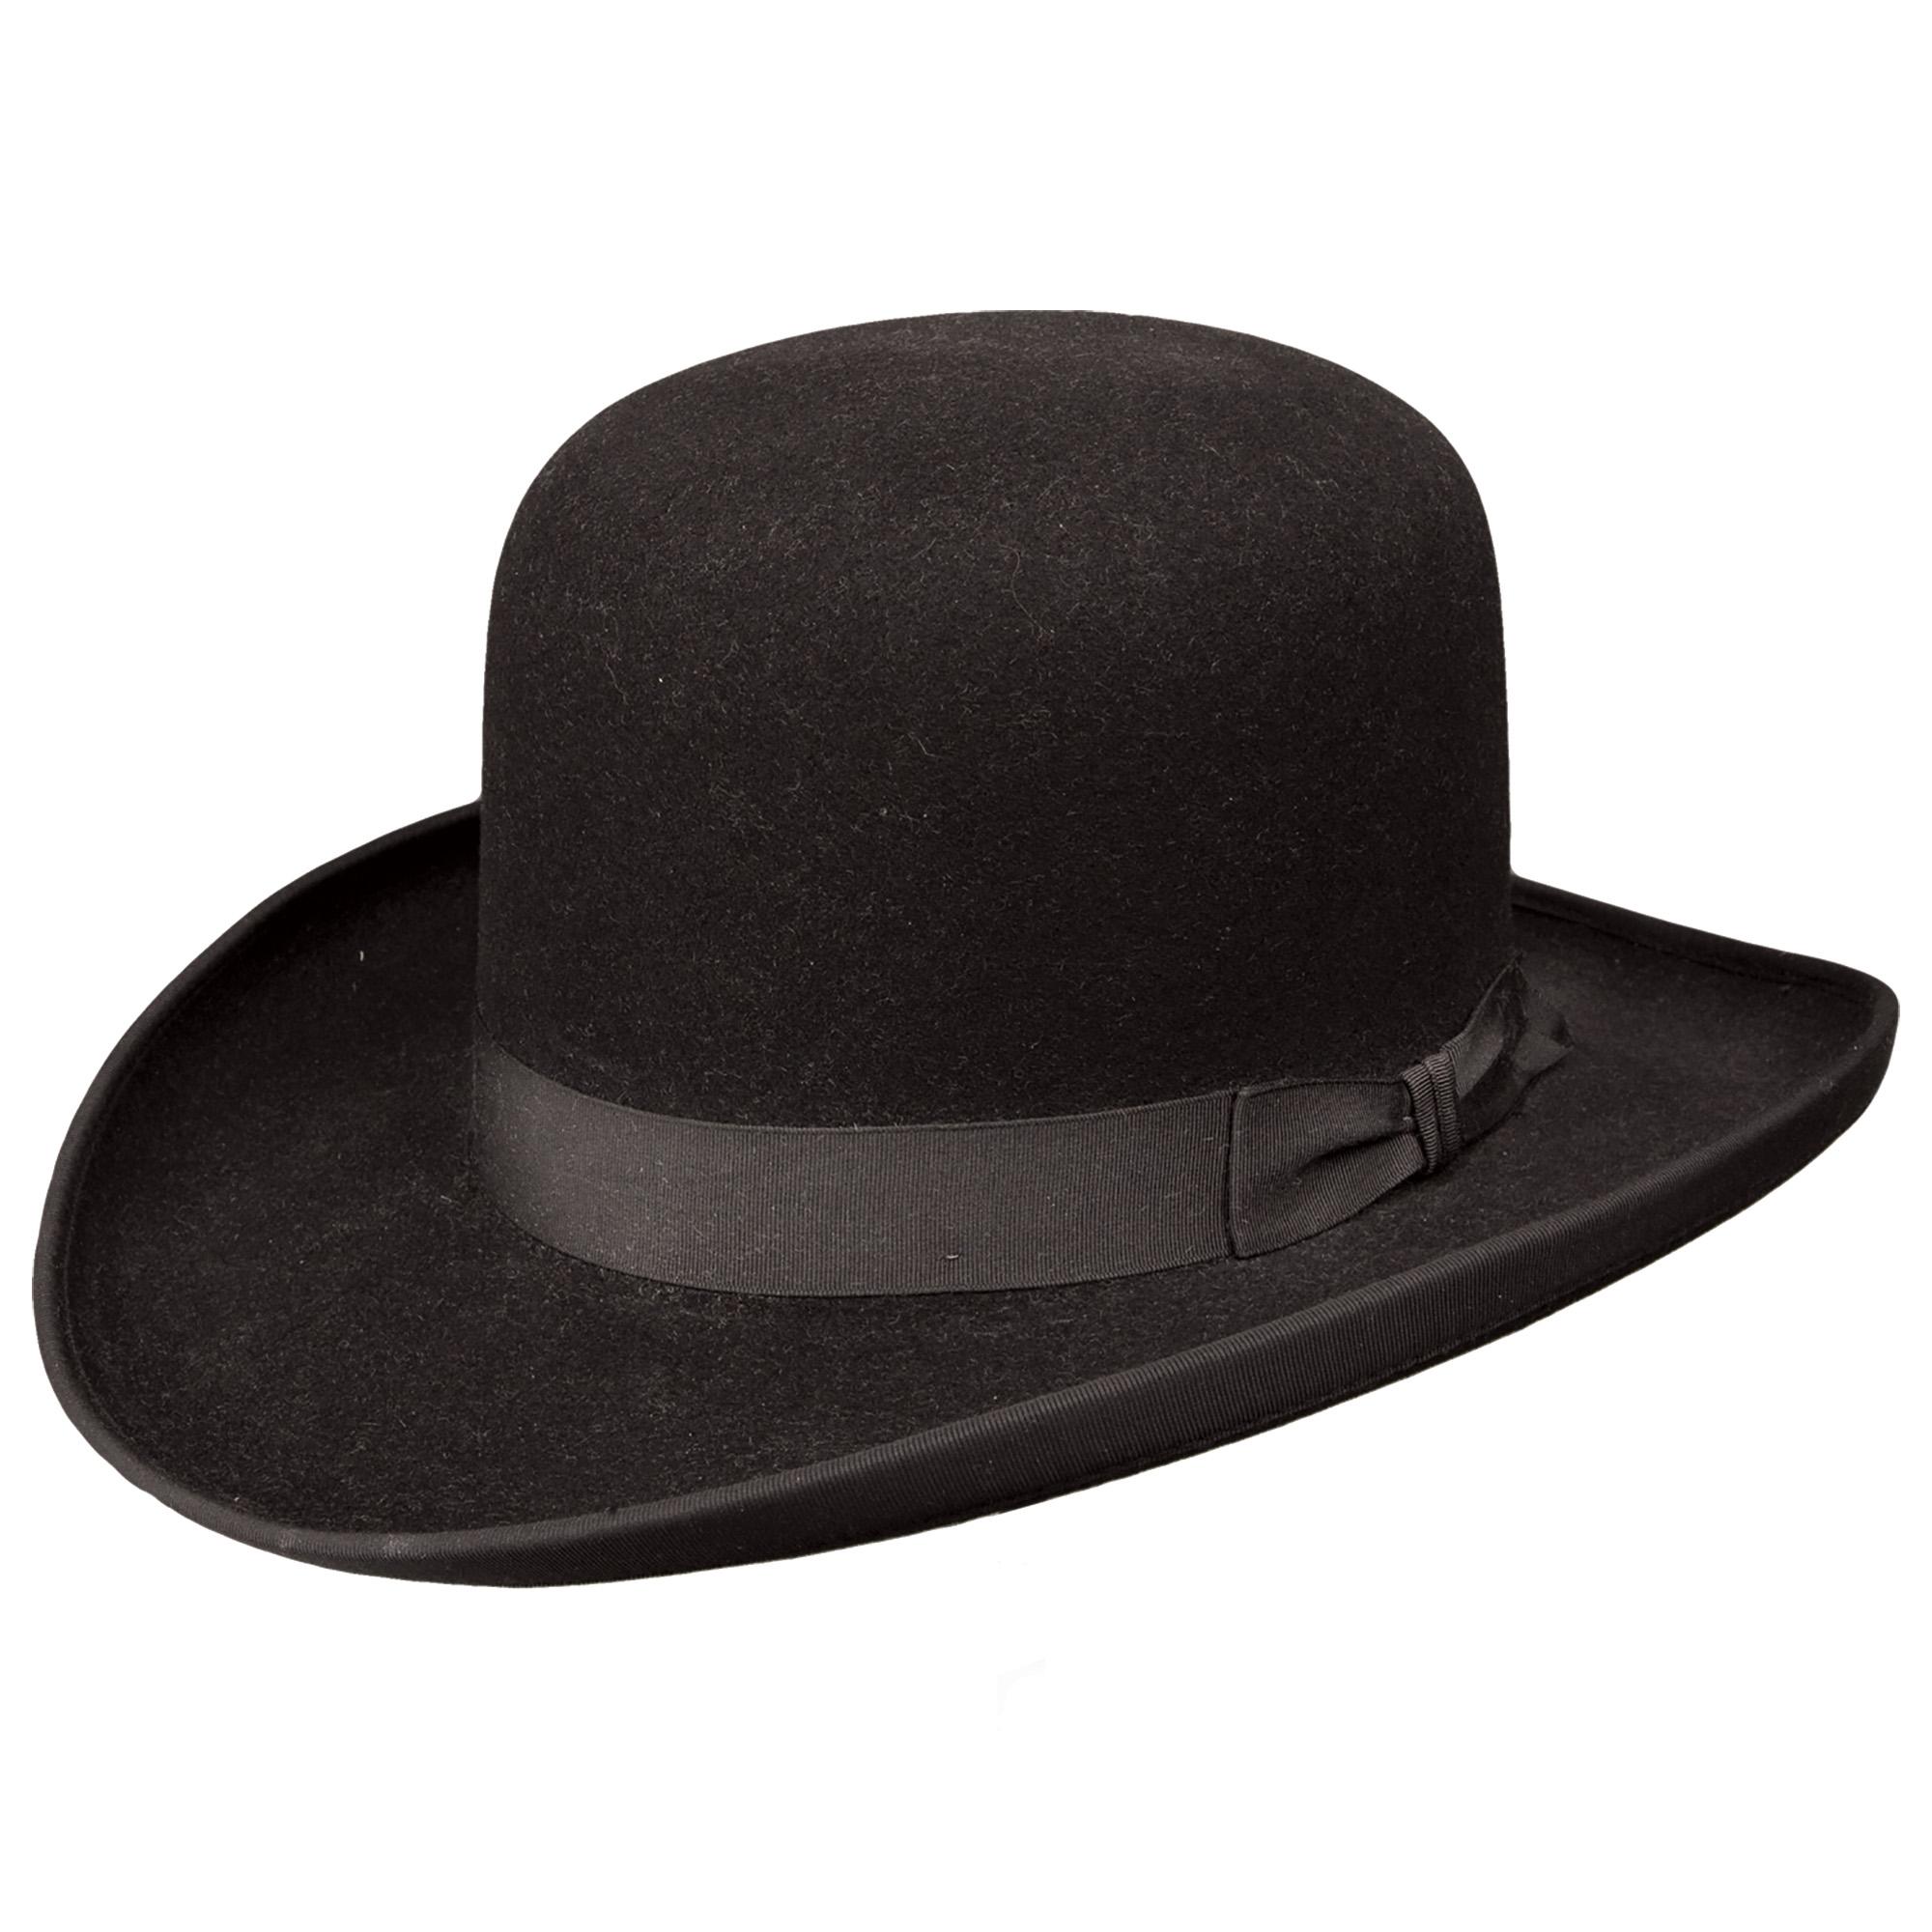 Promotional Cowboy Hats